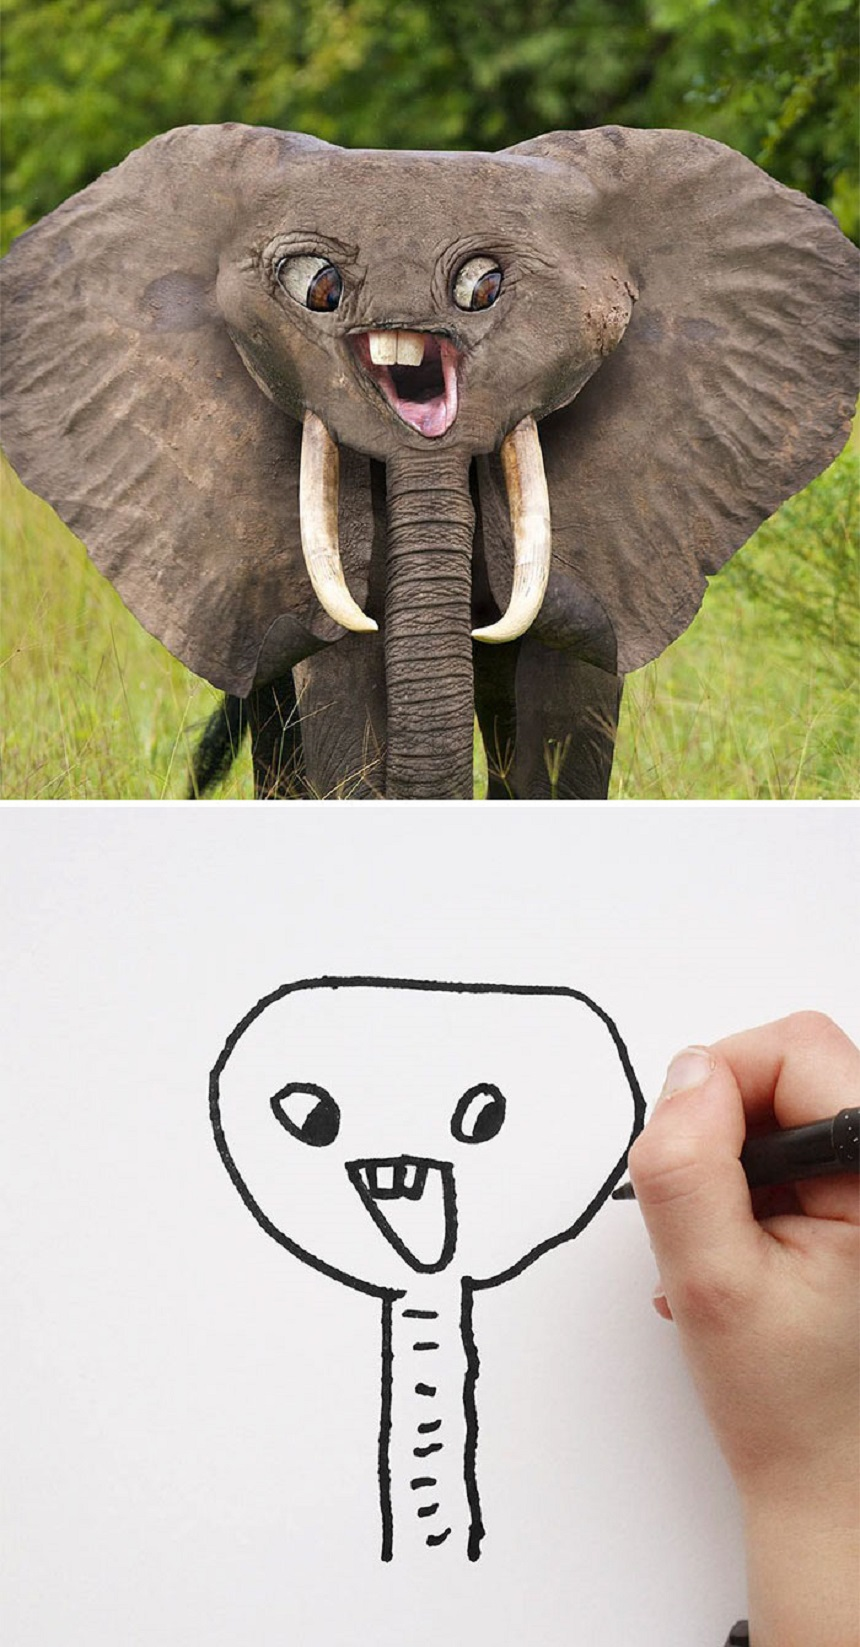 Dibujo de un elefante